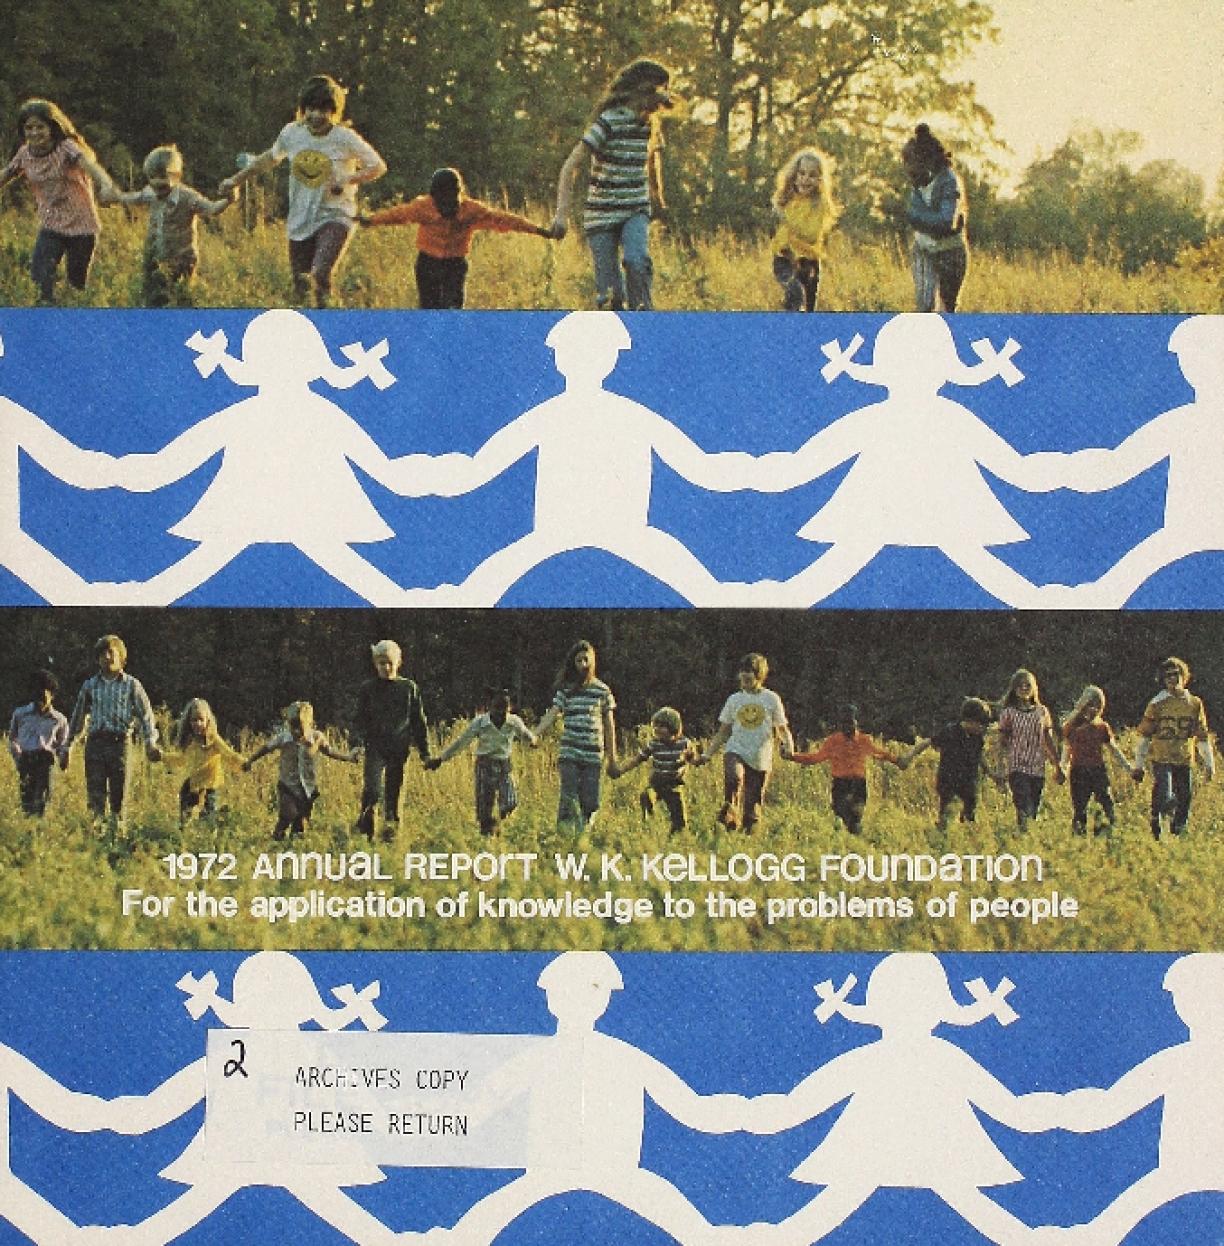 1972 W.K. Kellogg Foundation Annual Report